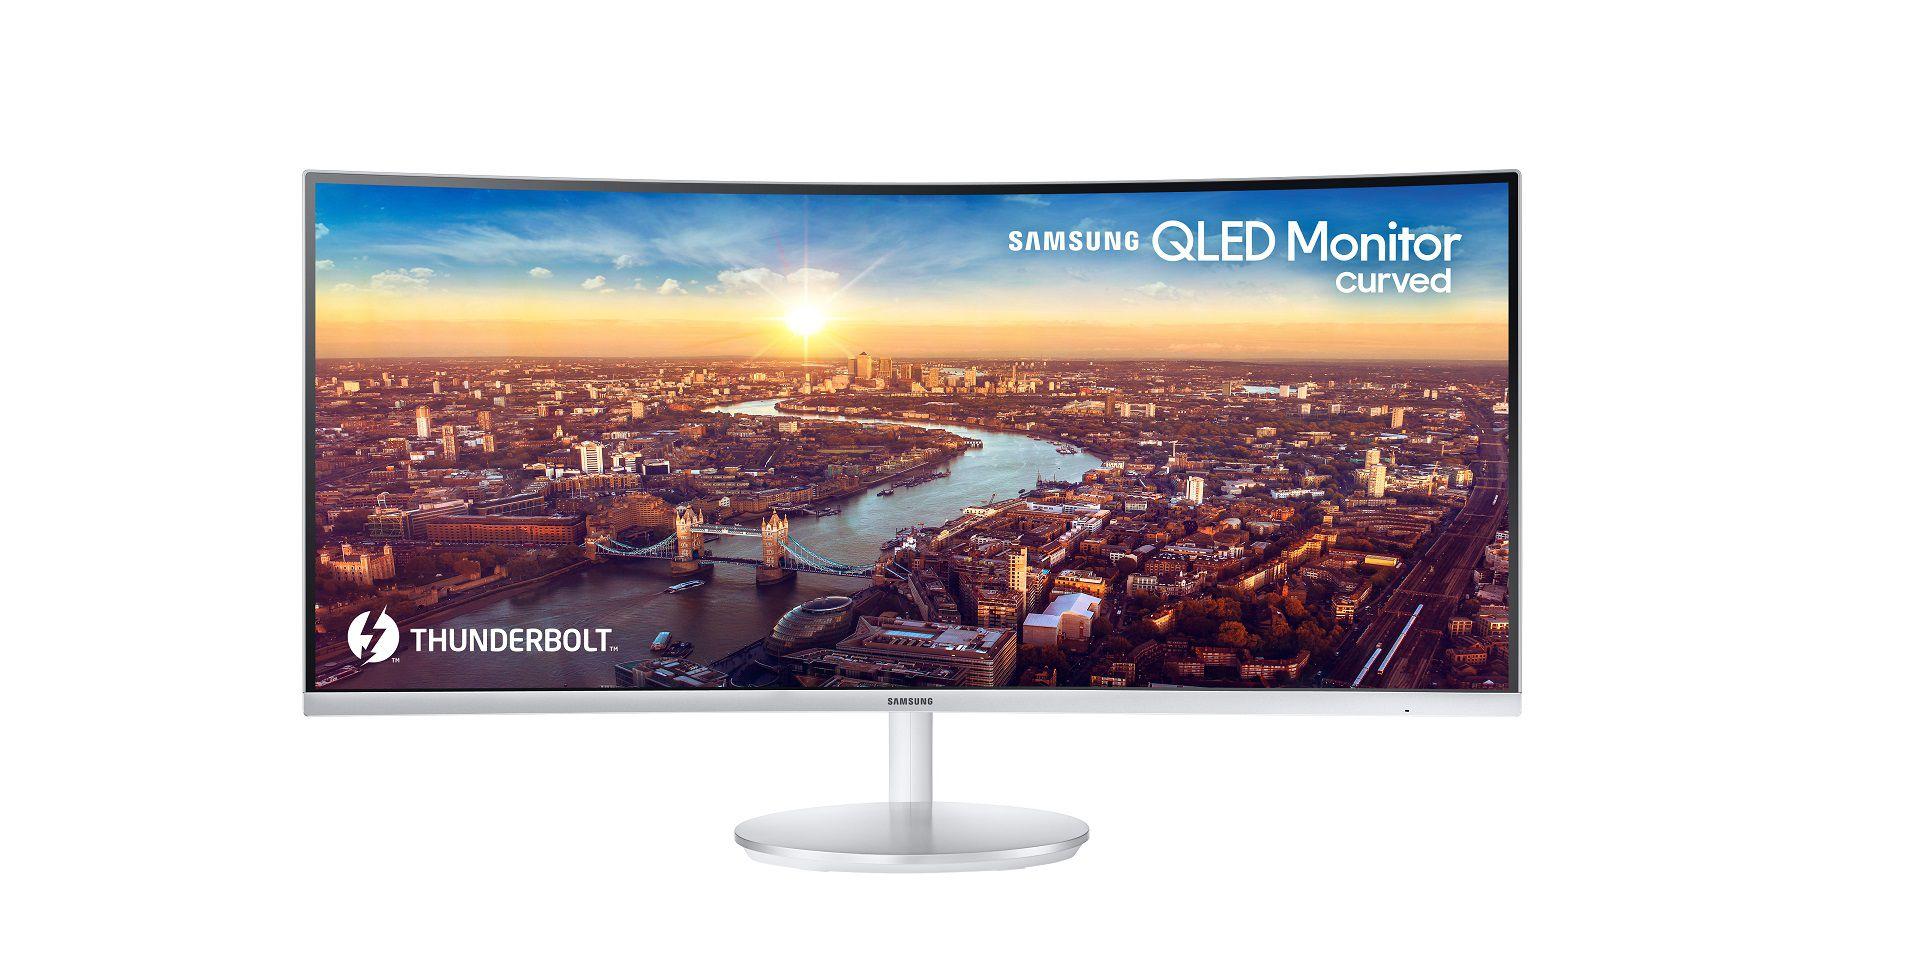 pripojiť tri monitory Windows 7